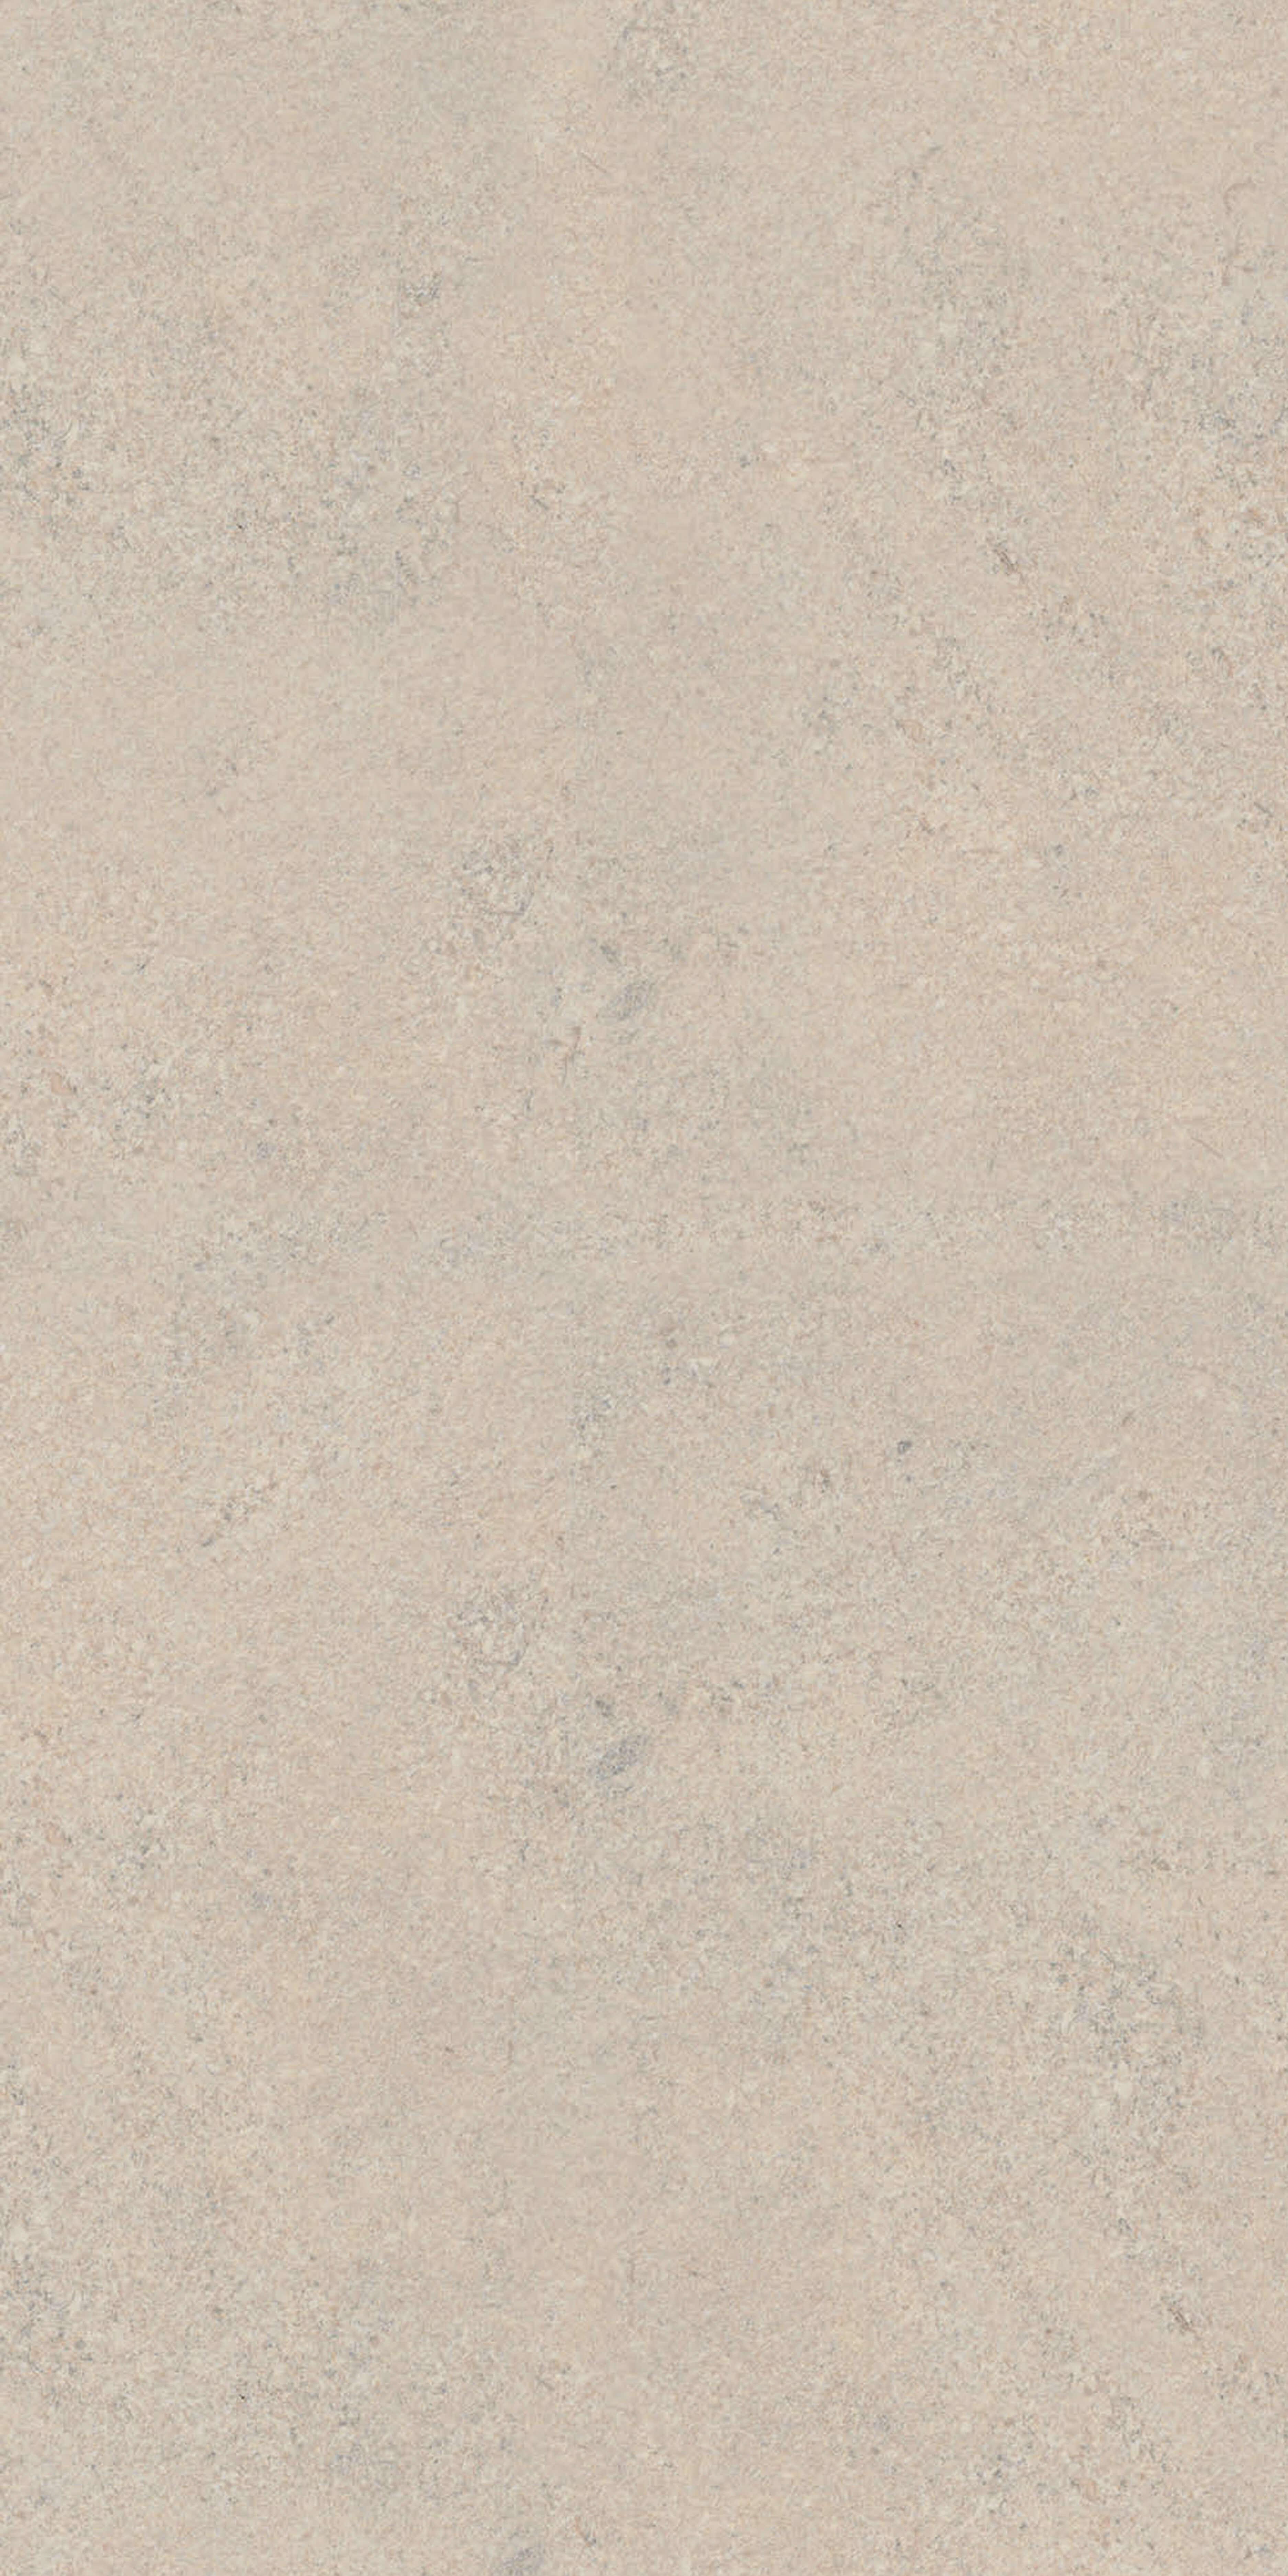 Kashmir White S63022 BR